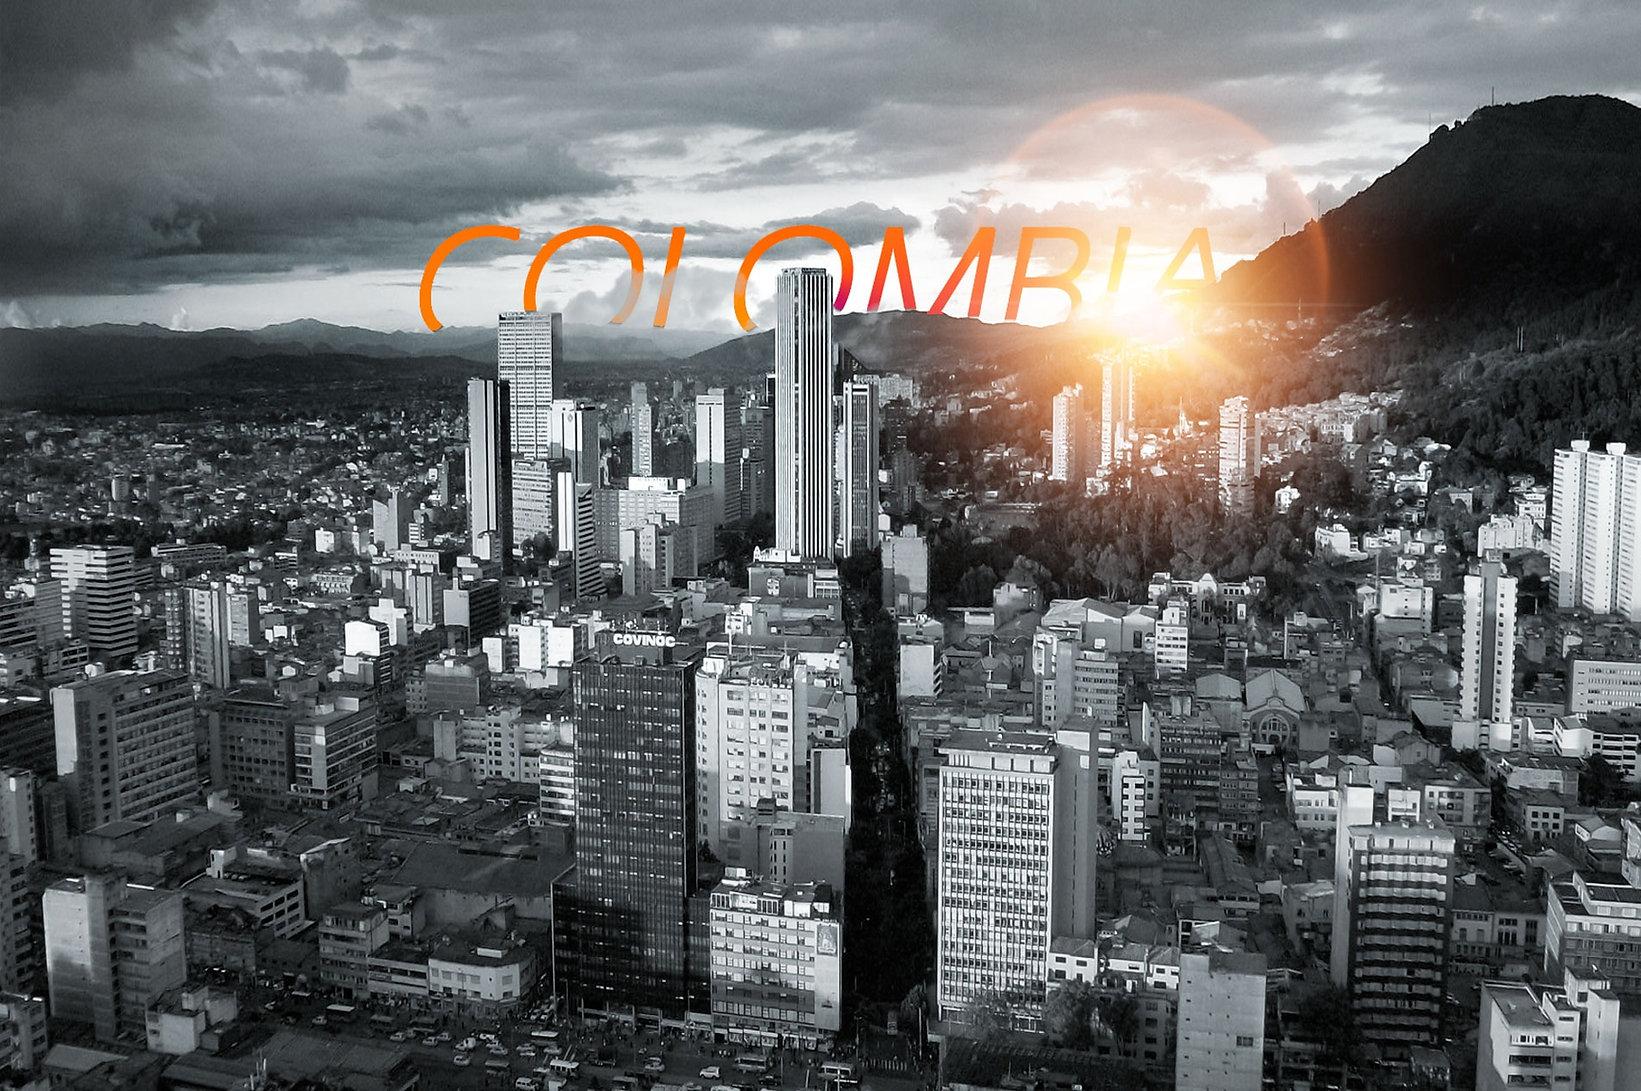 COLOMBIA-_edited.jpg